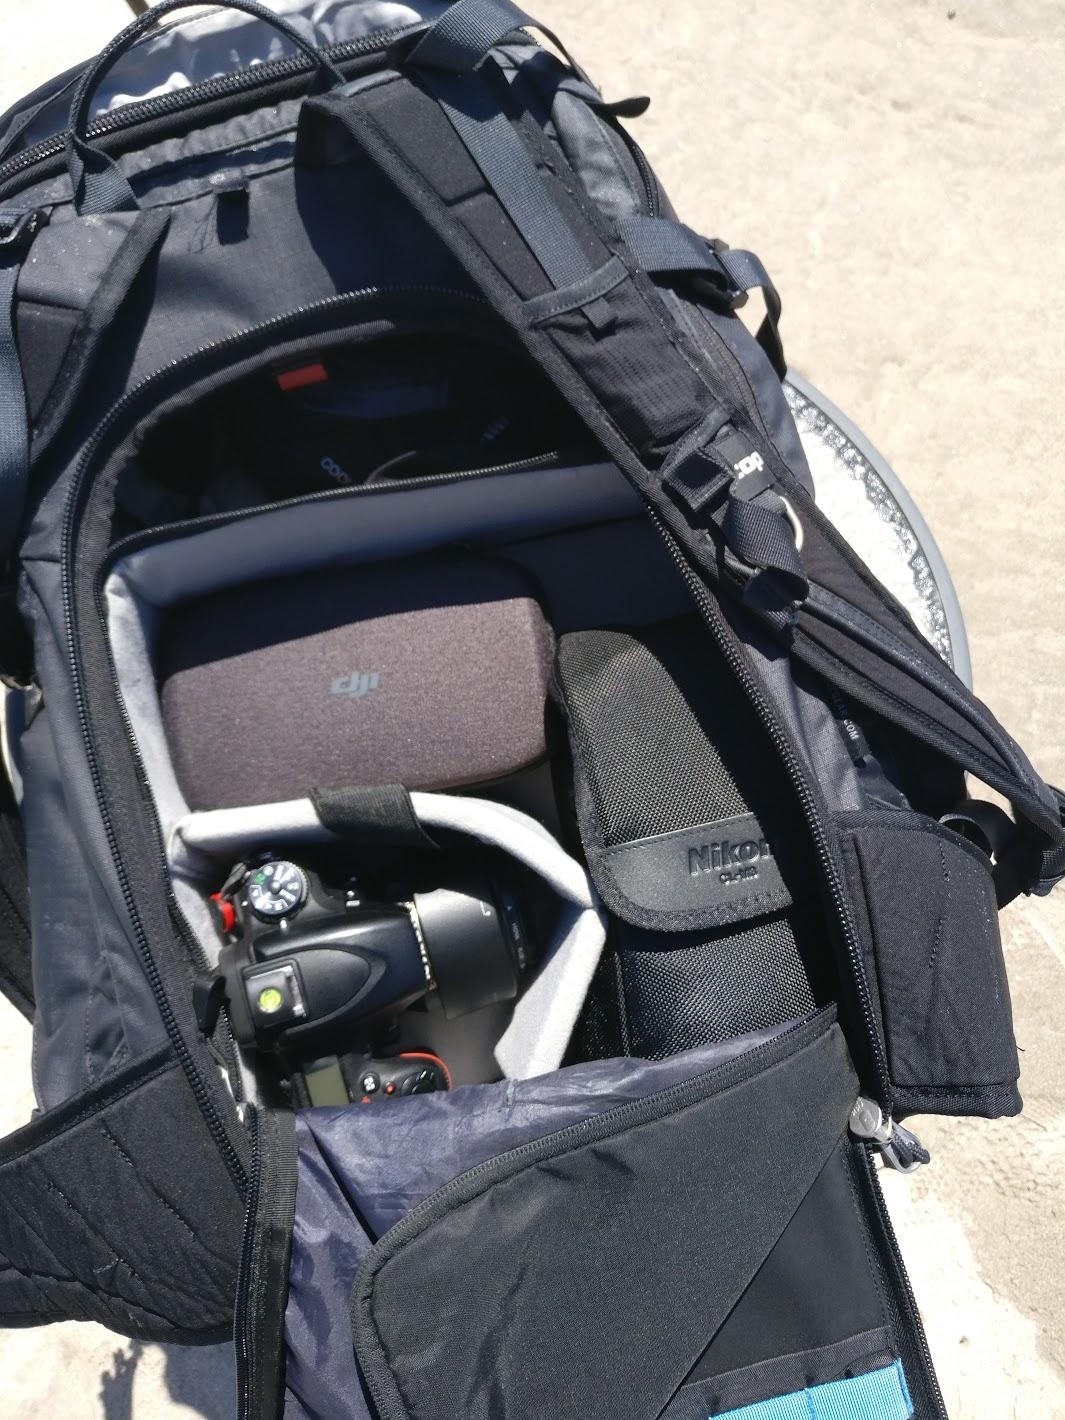 DJI-Mavic-Air-Cool-Fits-In-FStop-Bag-Easy.jpg